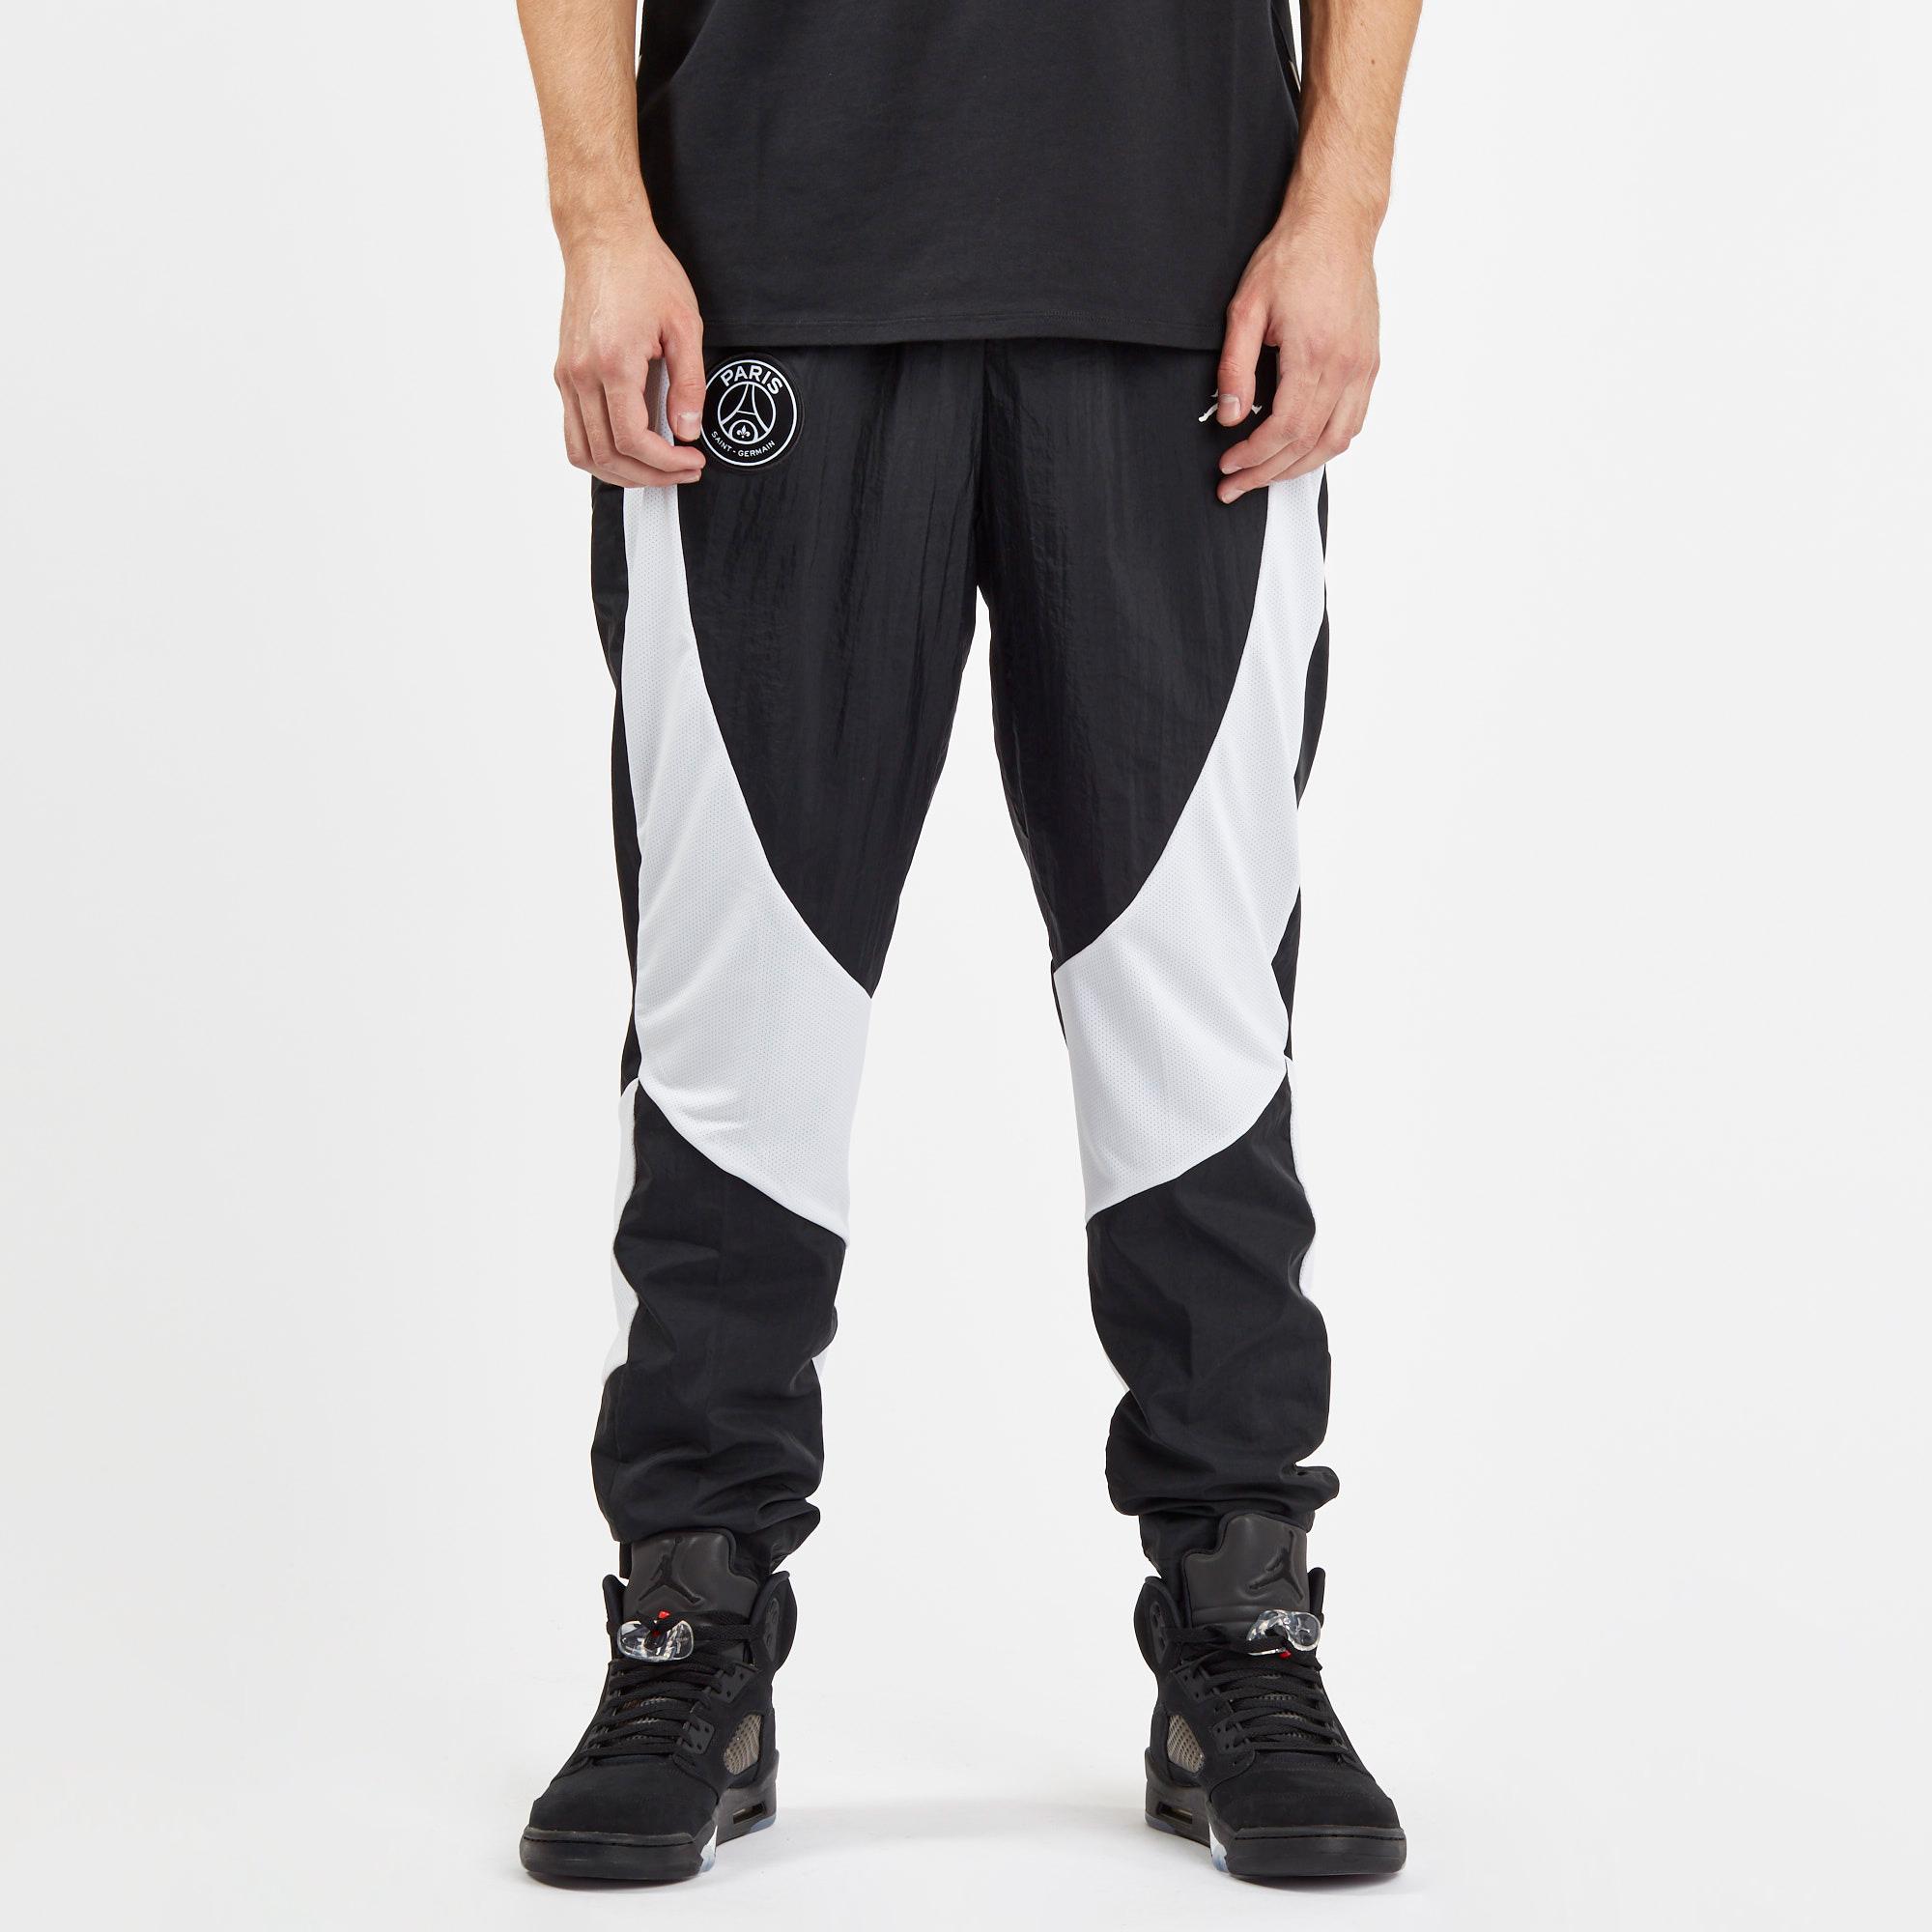 d01474756a95 Jordan Brand BCFC AJ1 Pant - Bq4224-010 - Sneakersnstuff